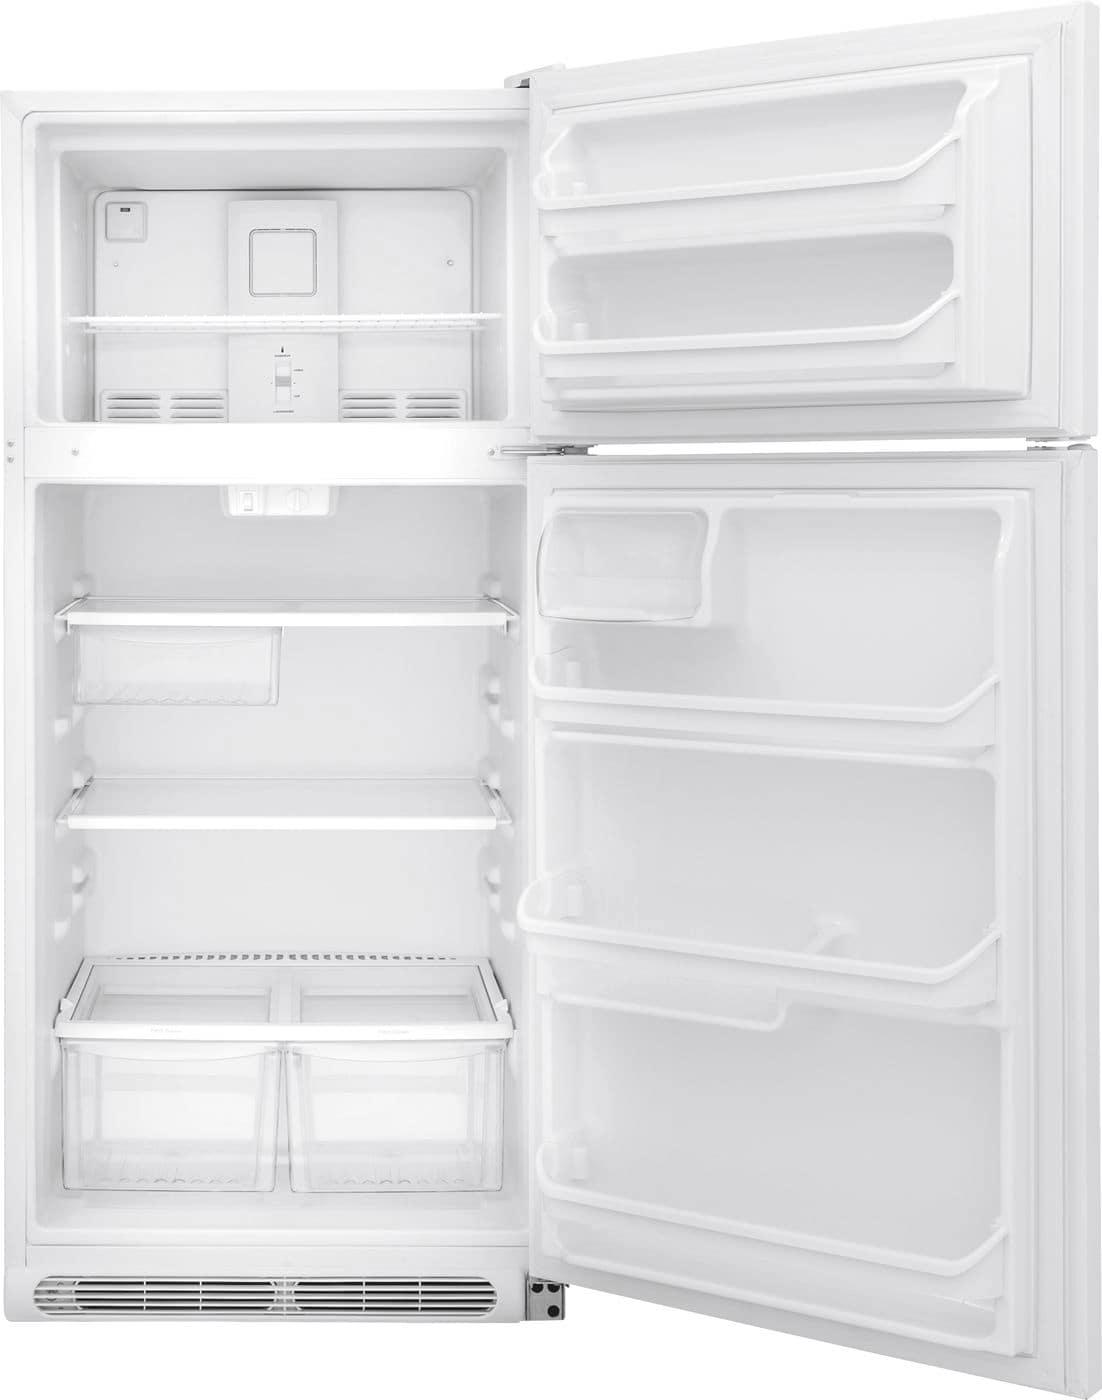 Model: FFTR1821TW | Frigidaire 18 Cu. Ft. Top Freezer Refrigerator